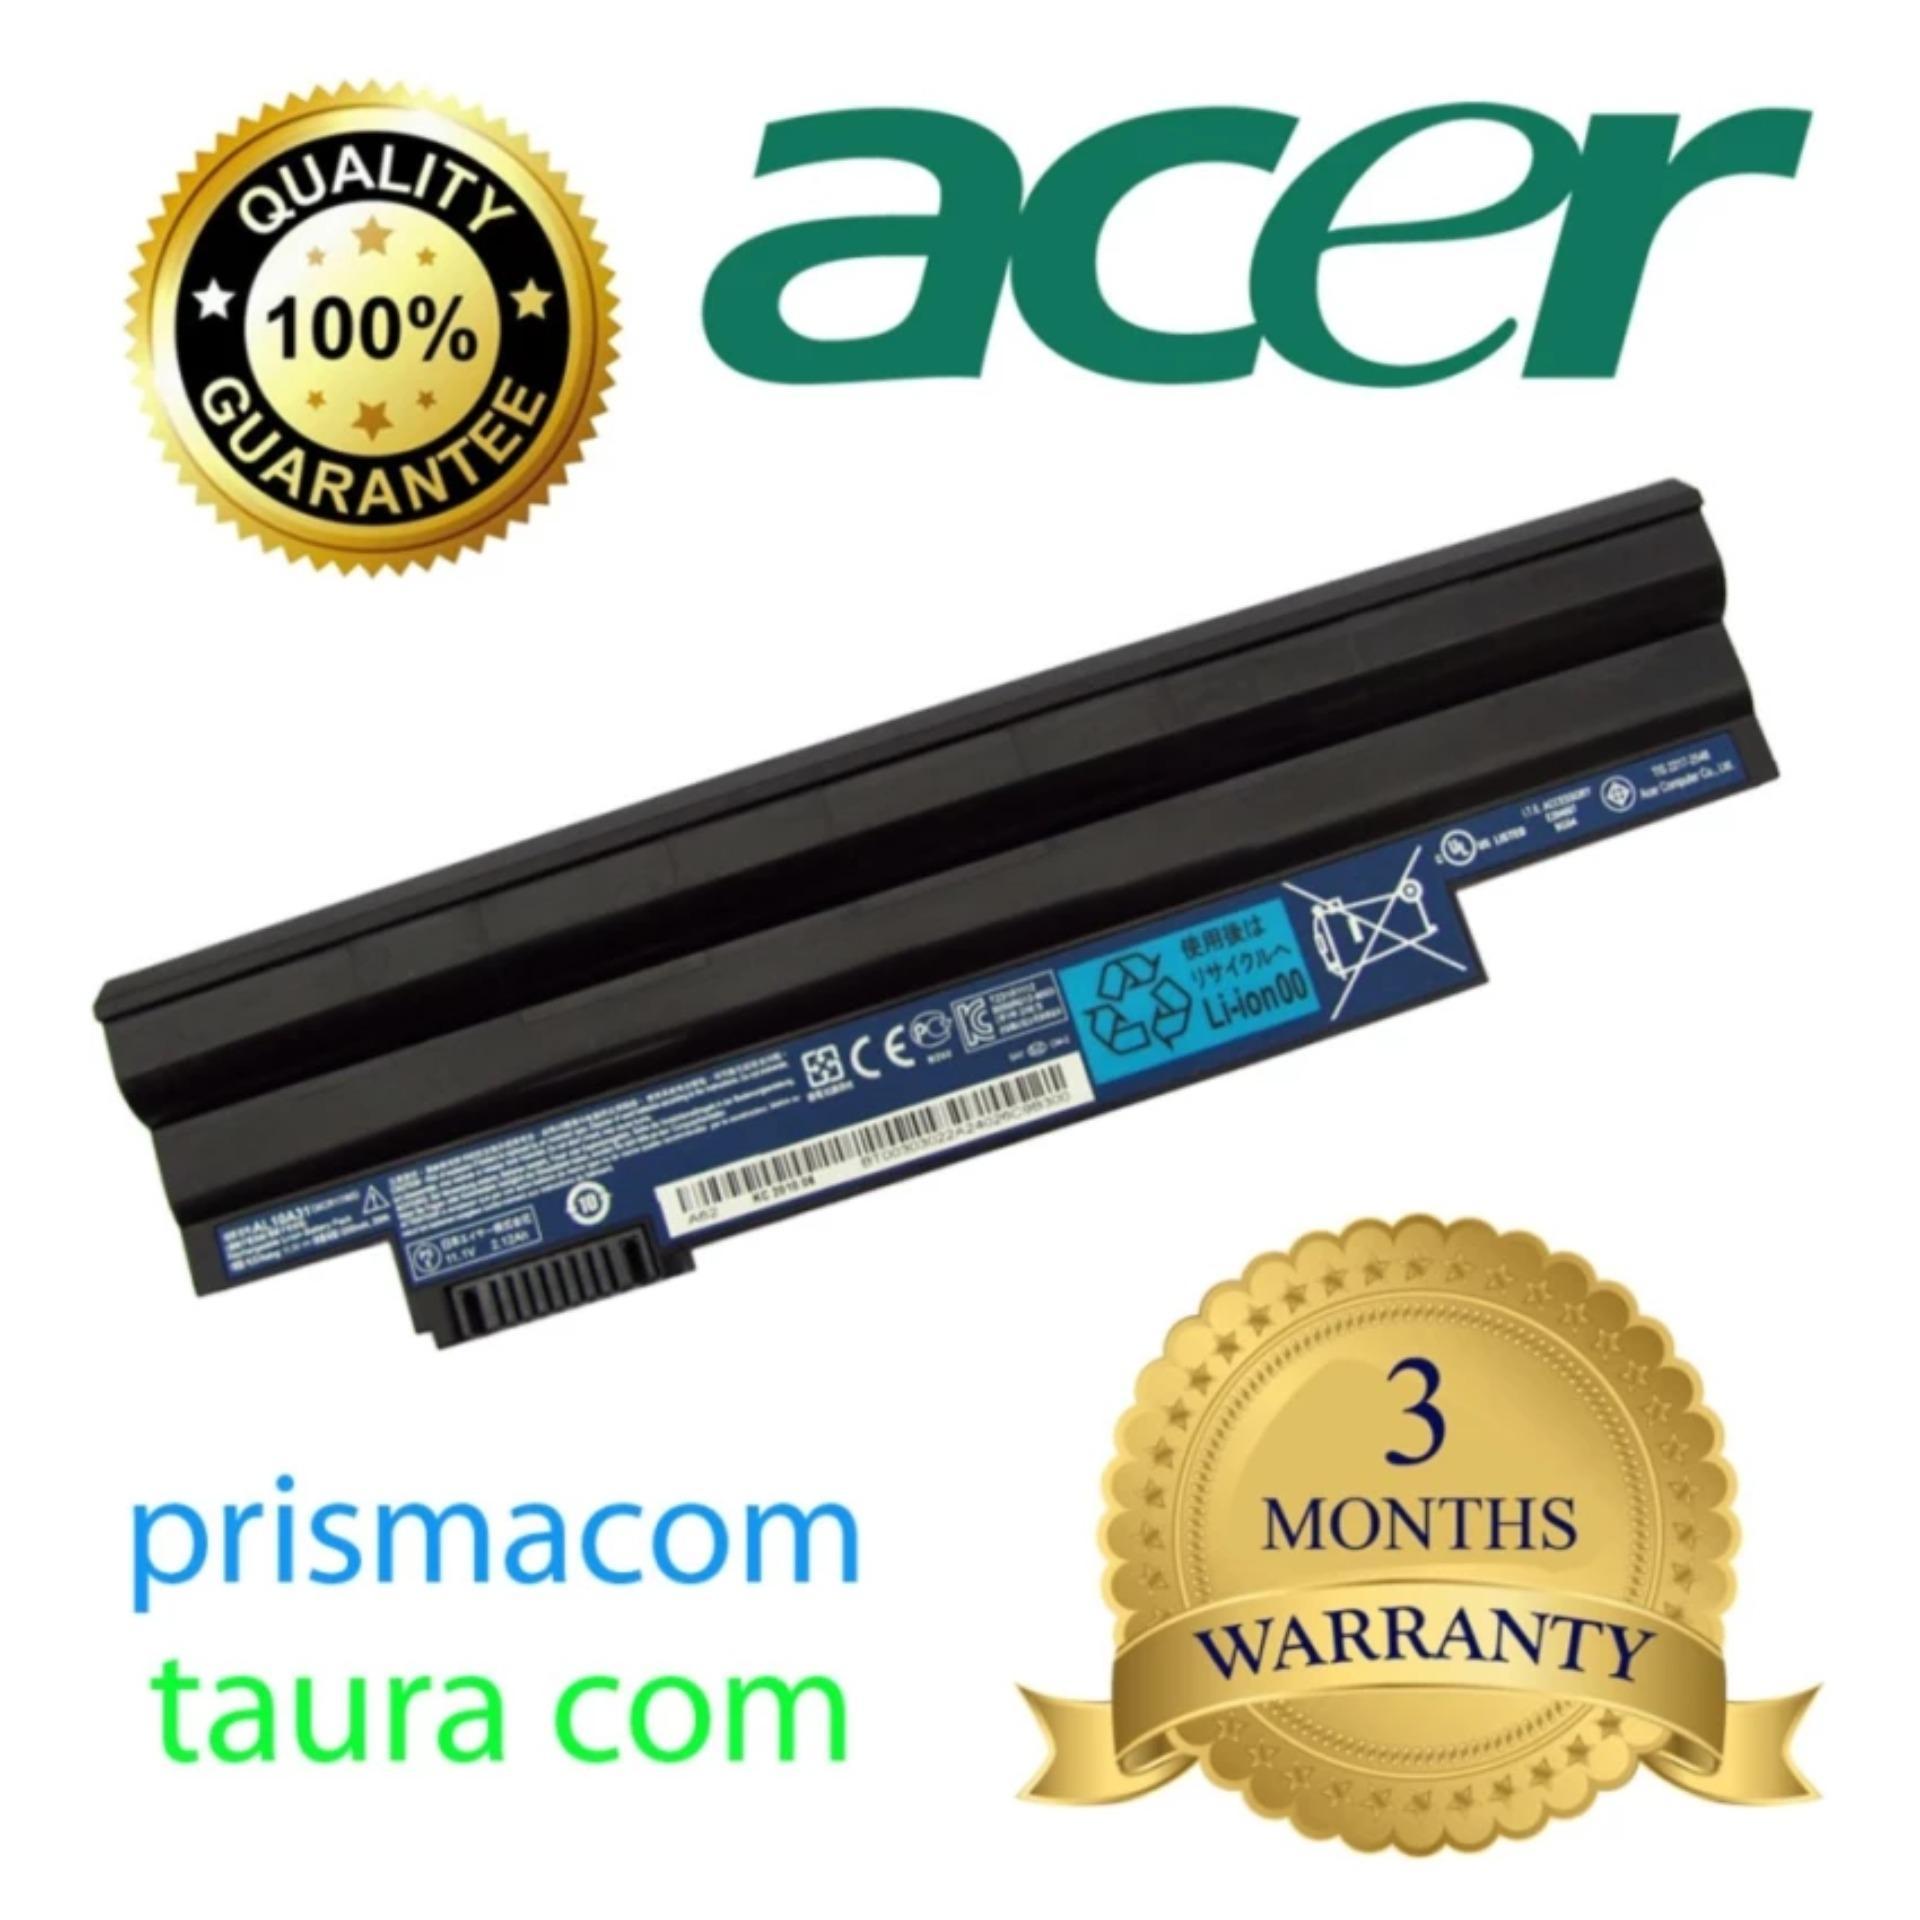 Daftar Harga Laptop Acer Aspire One 722 Terbaru Maret 2018 Keyboard 721 753 Series Hitam Original Baterai D255 D257 D260 D270 Black Al10a31